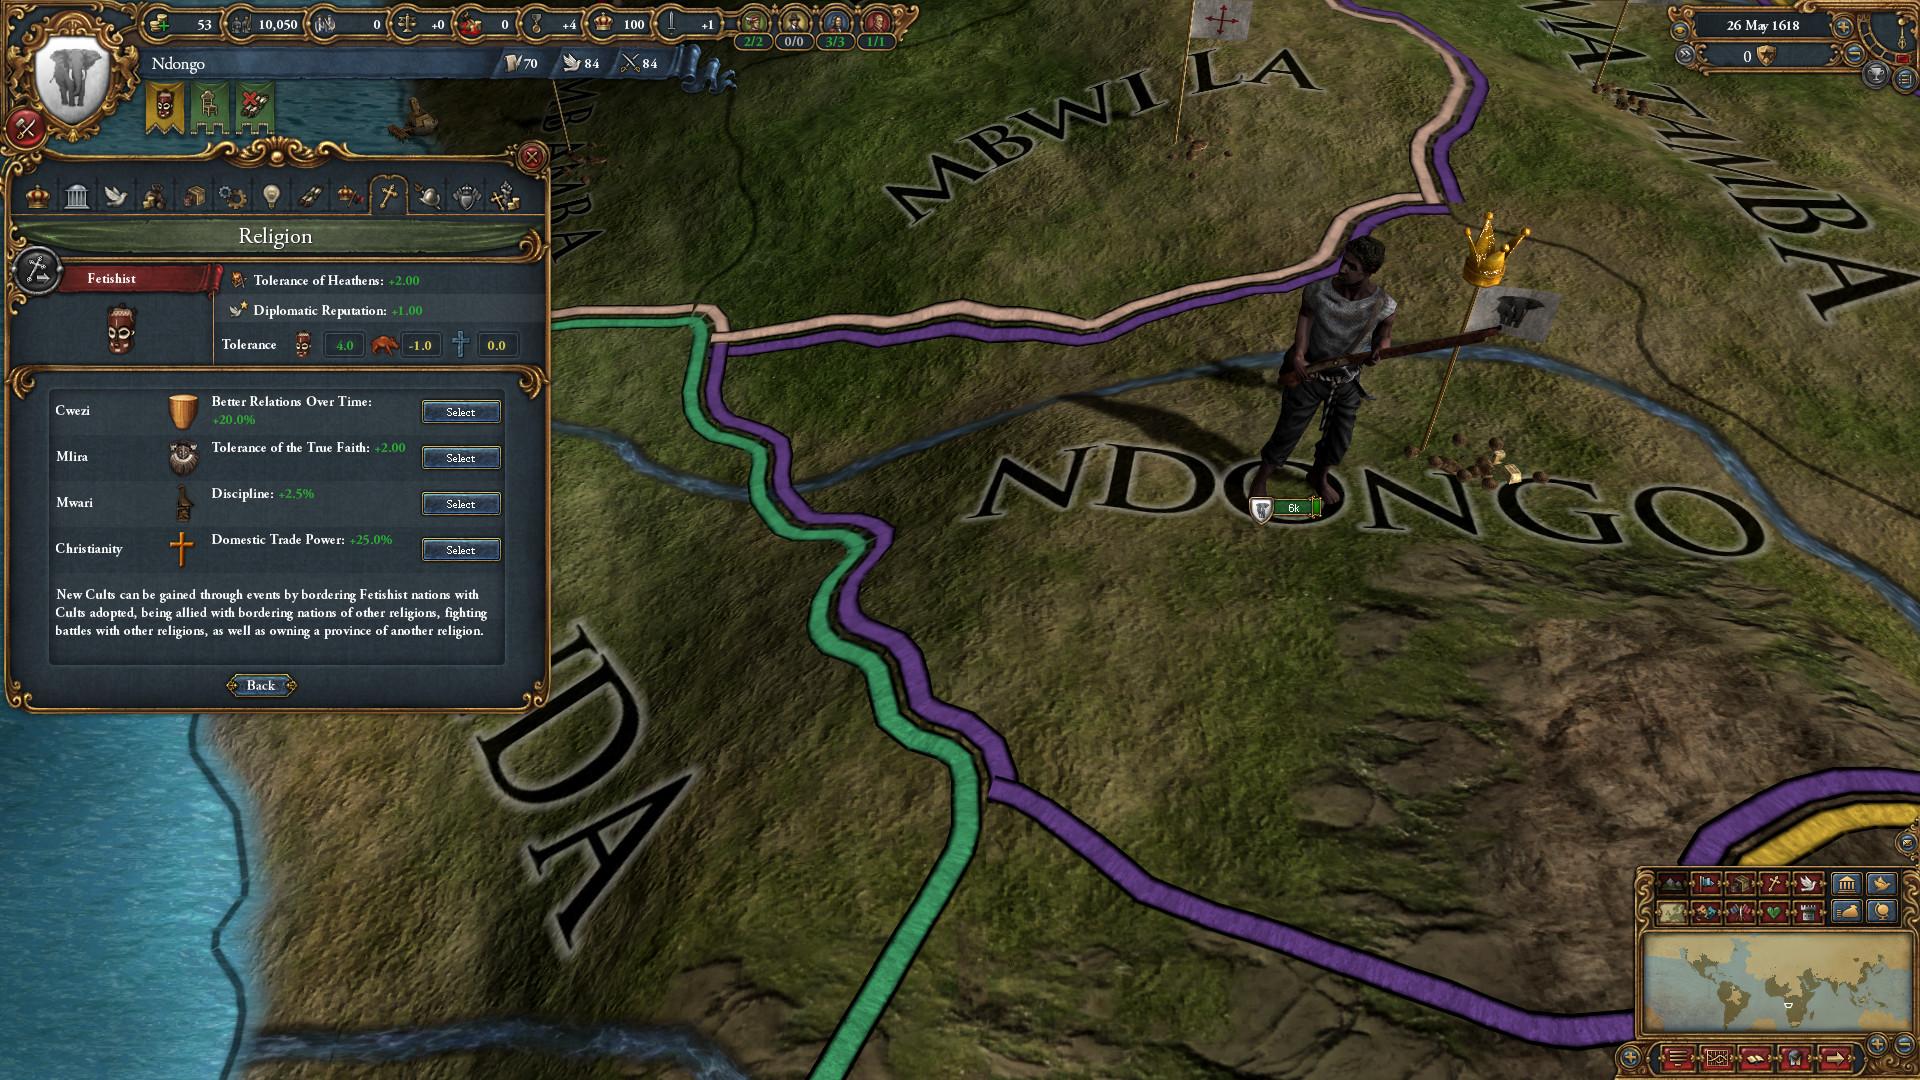 Europa Universalis IV: Rights of Man Screenshot 2